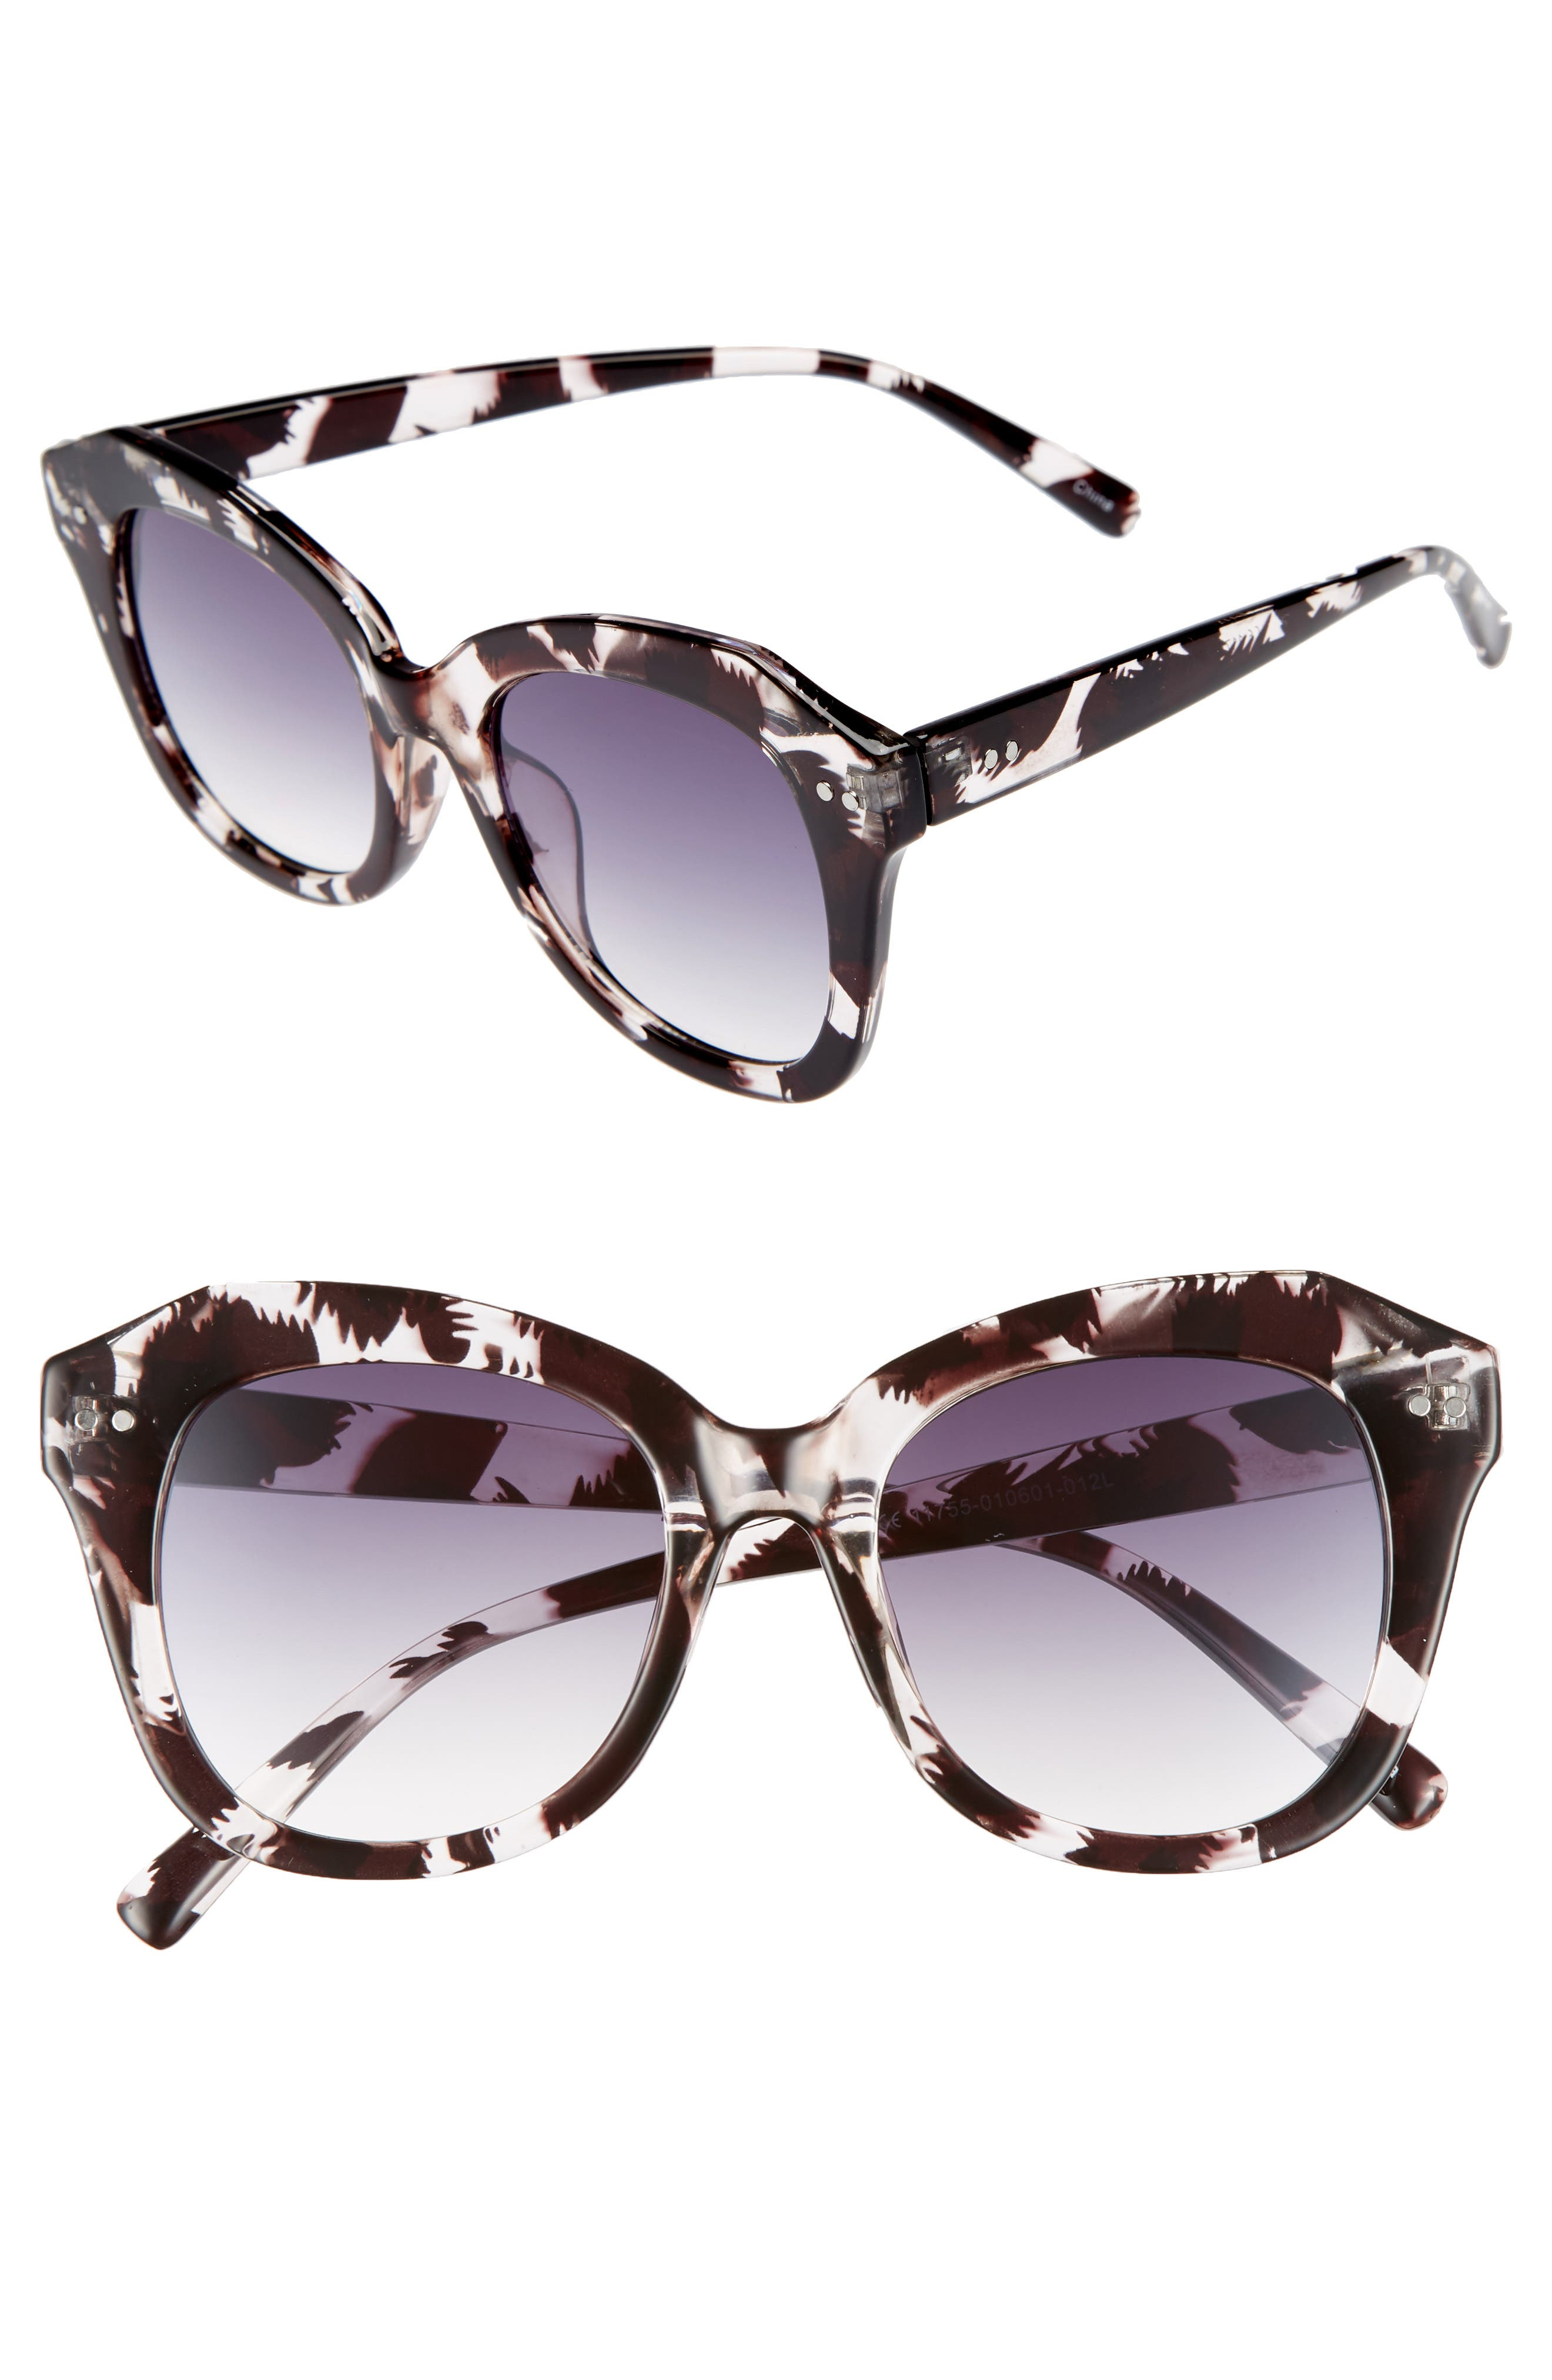 Marbled Square Sunglasses,                             Main thumbnail 1, color,                             001